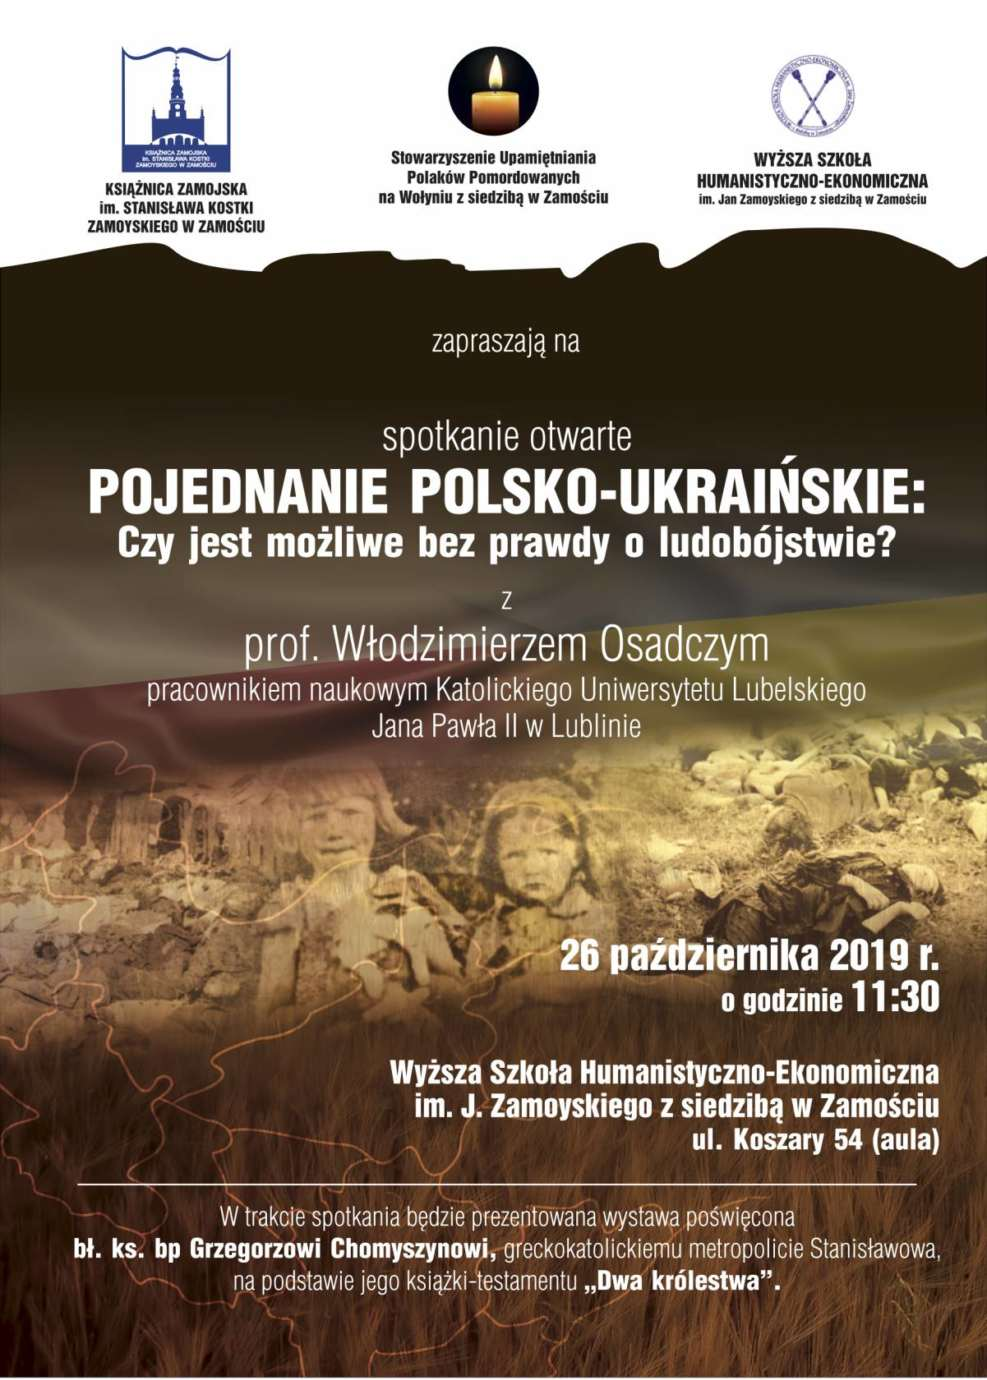 wolyn pojednanie polsko ukrainskie